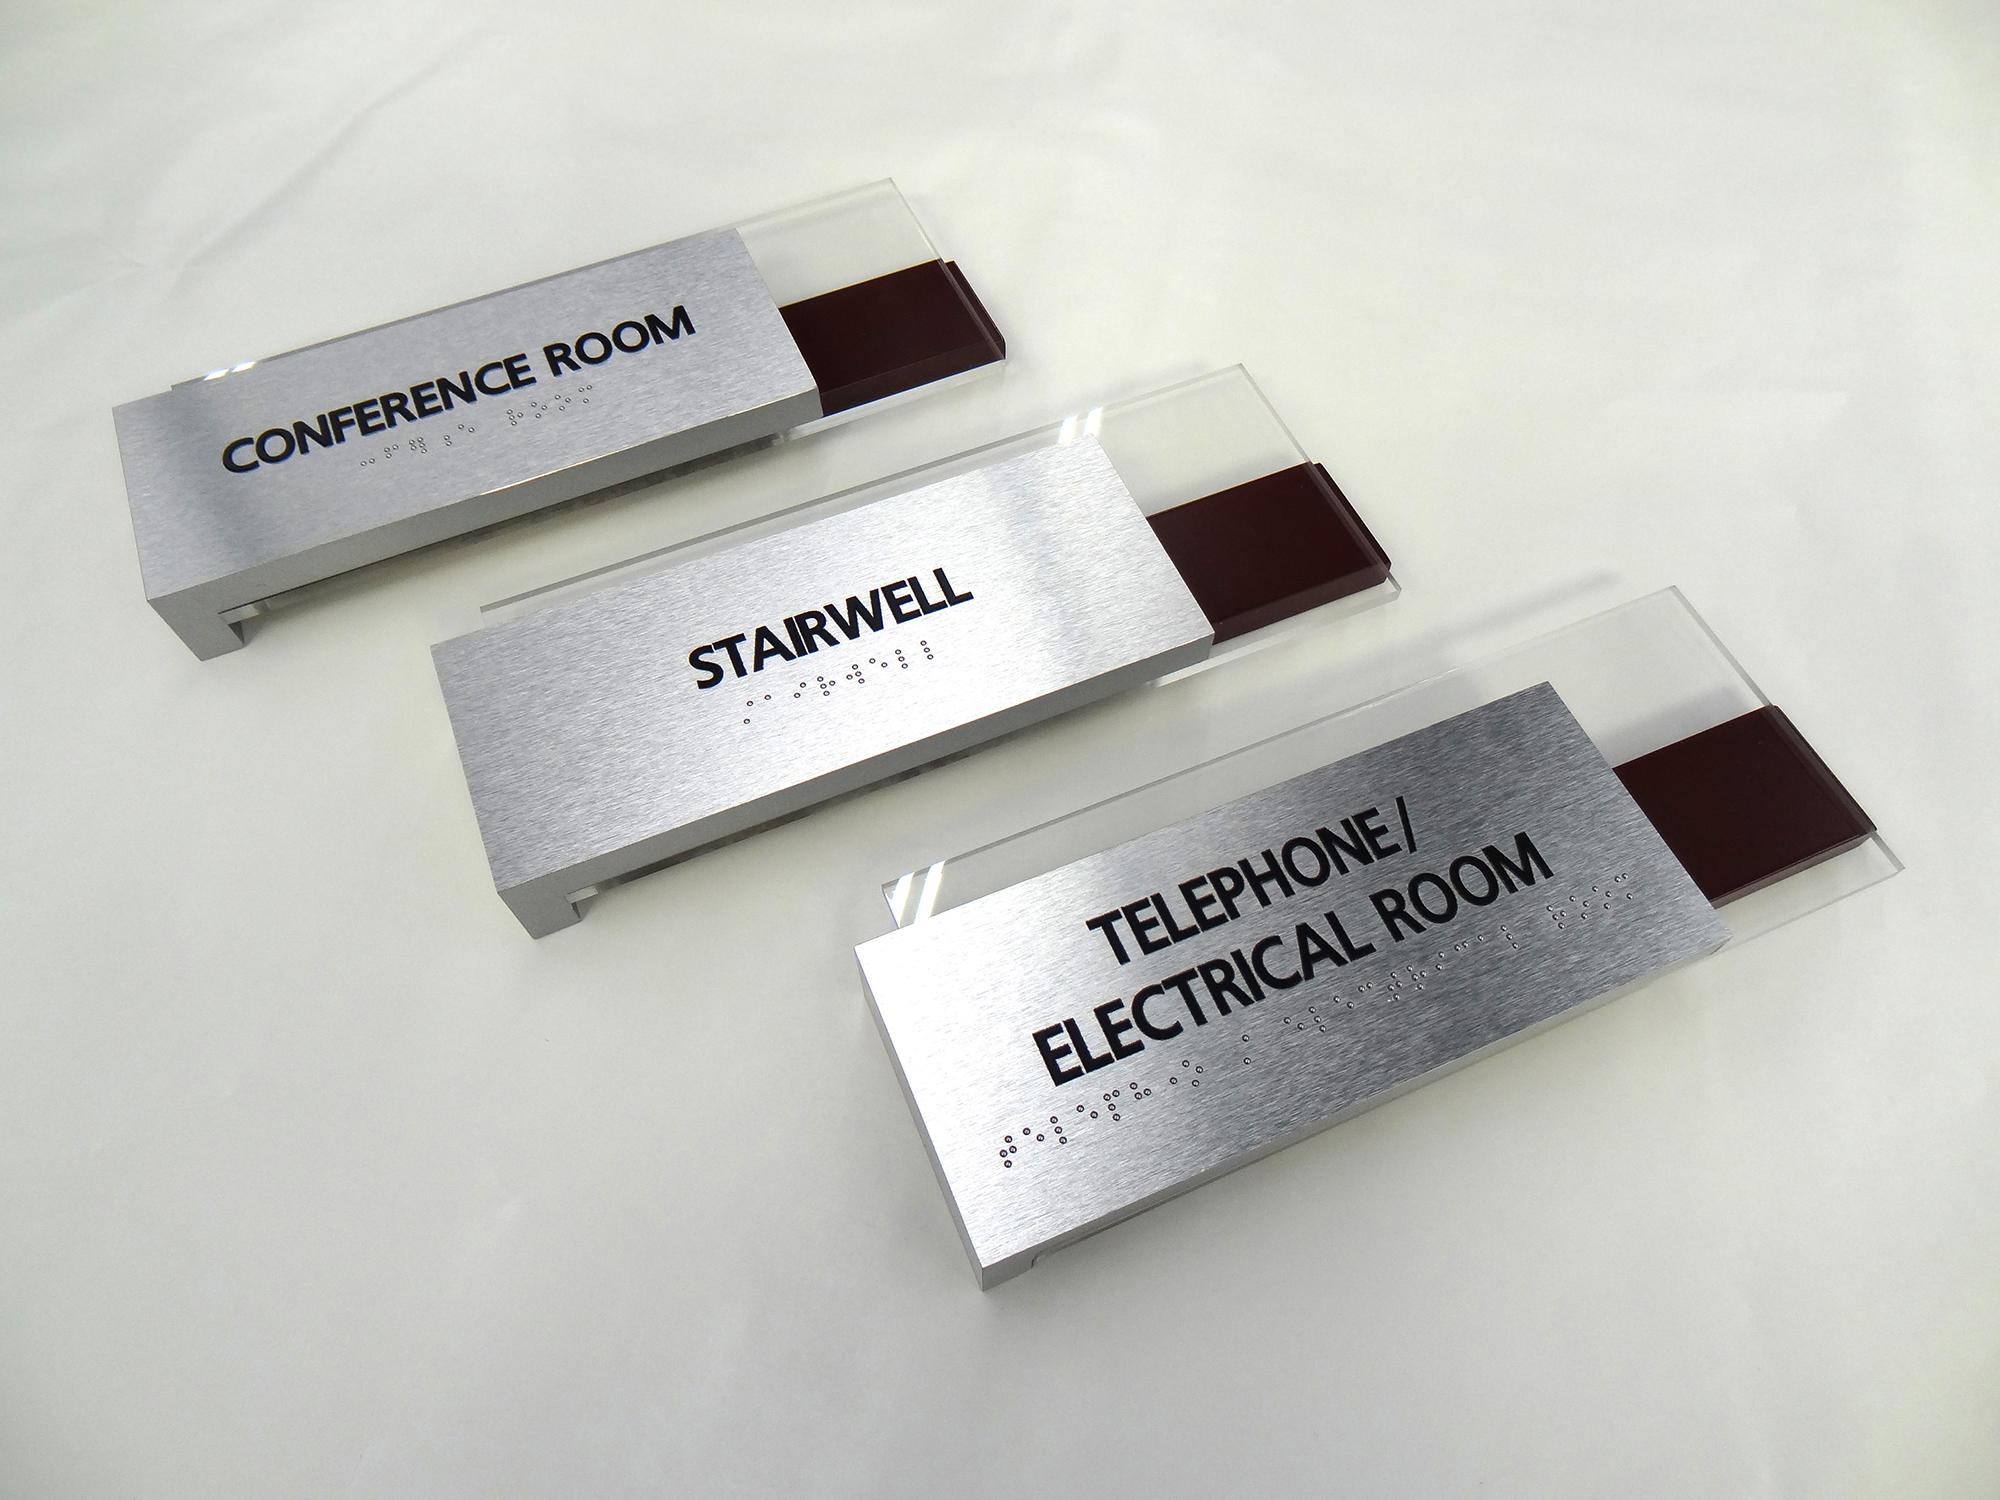 CIP - Room ID ADA & Braille